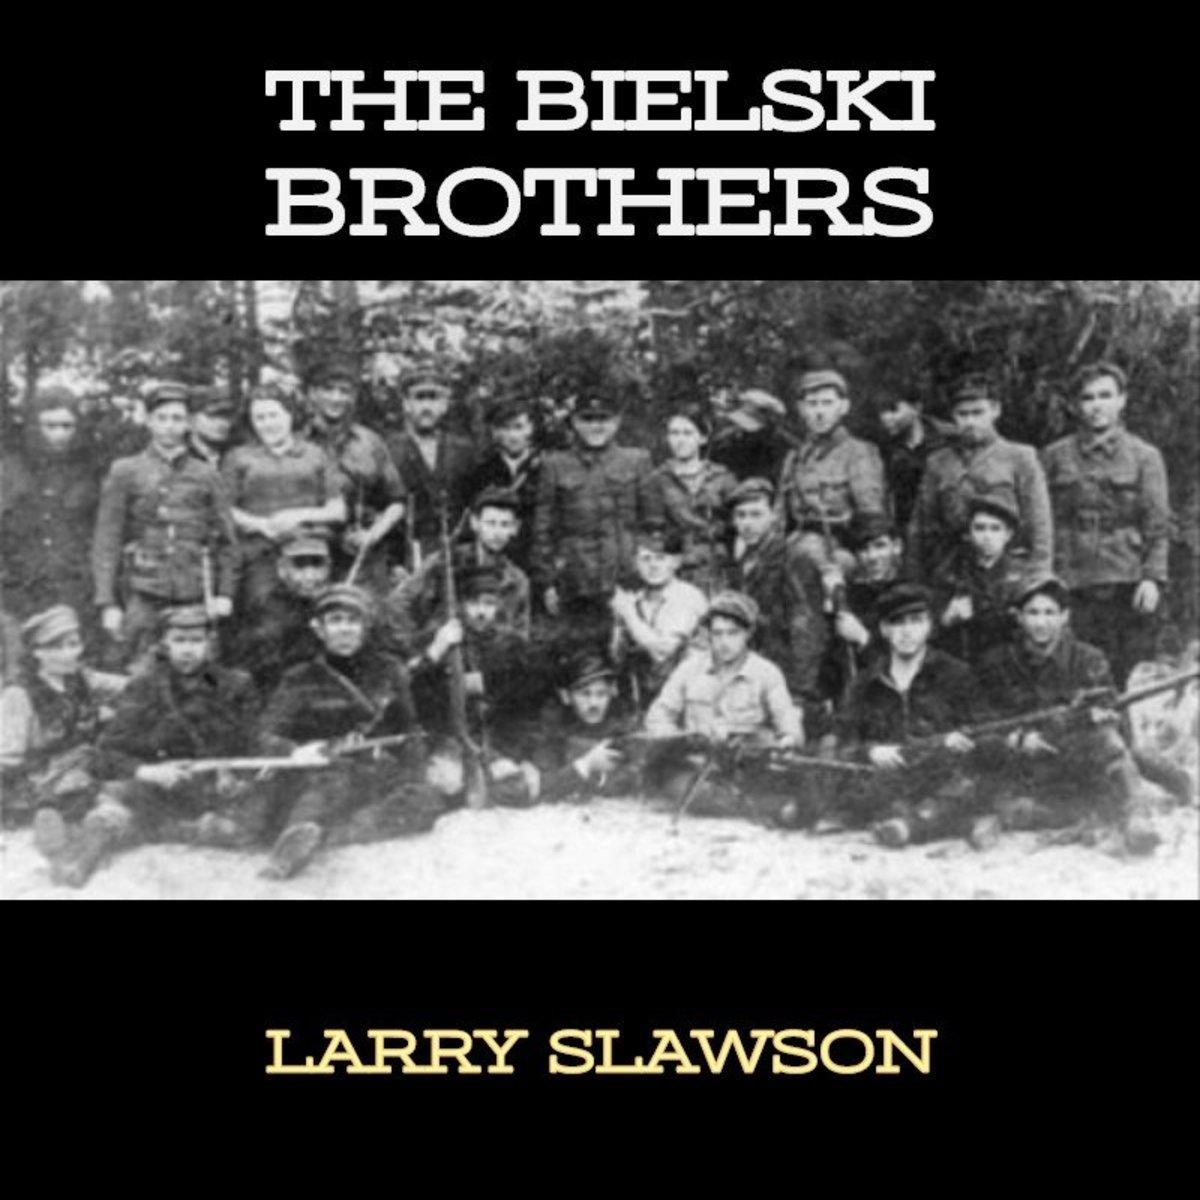 The Bielski Brothers.